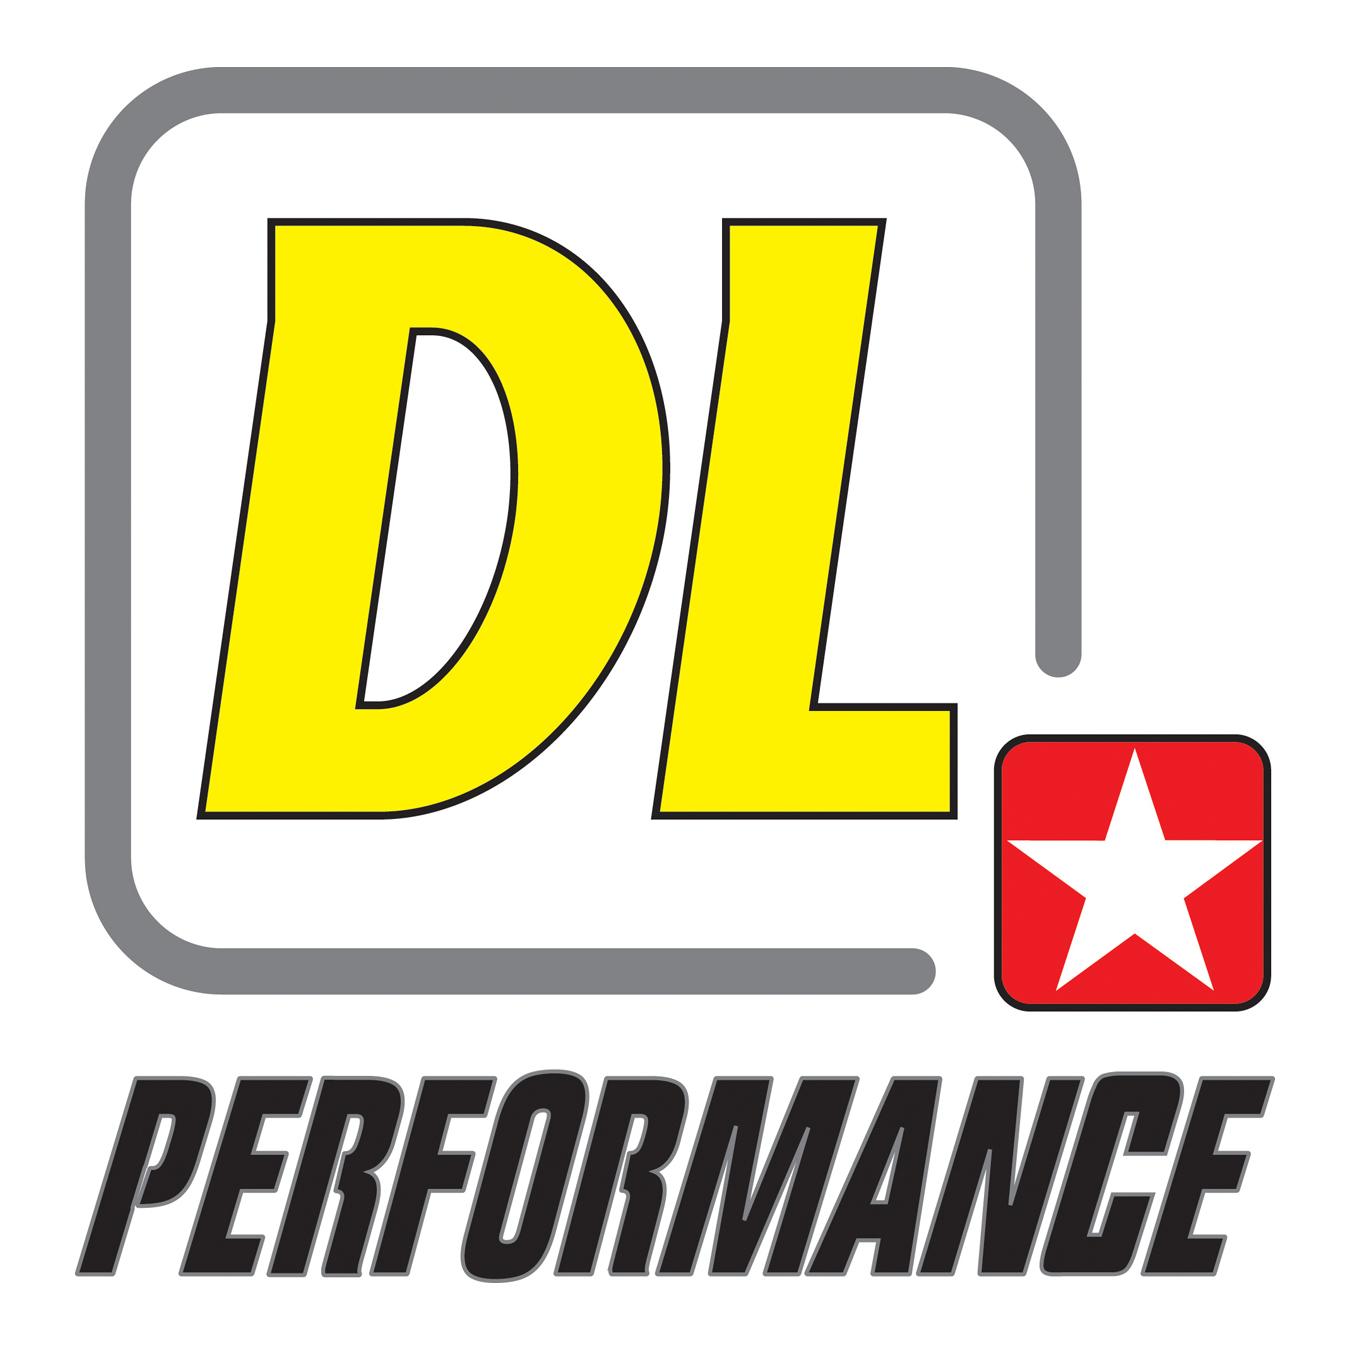 dl-logo.jpg